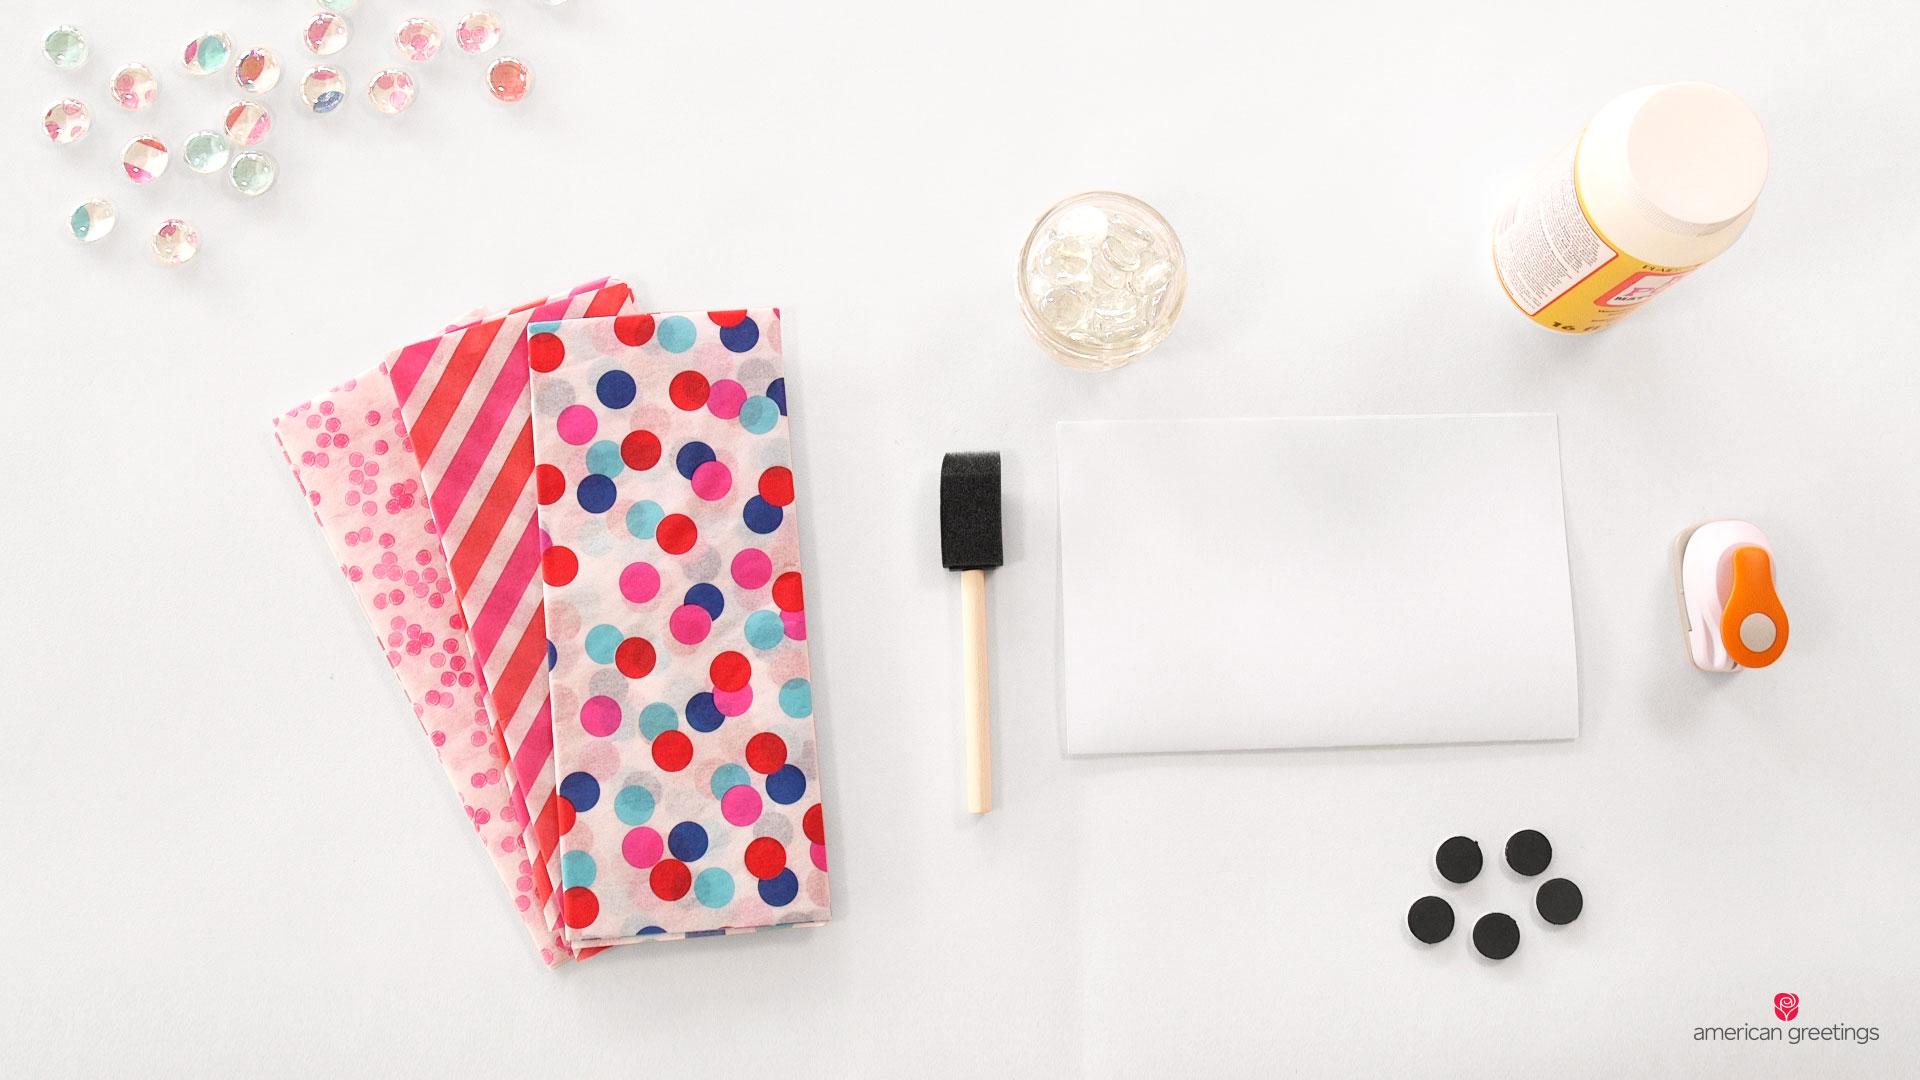 Tissue paper, foam brush, glass gems, paper, glue, magnets